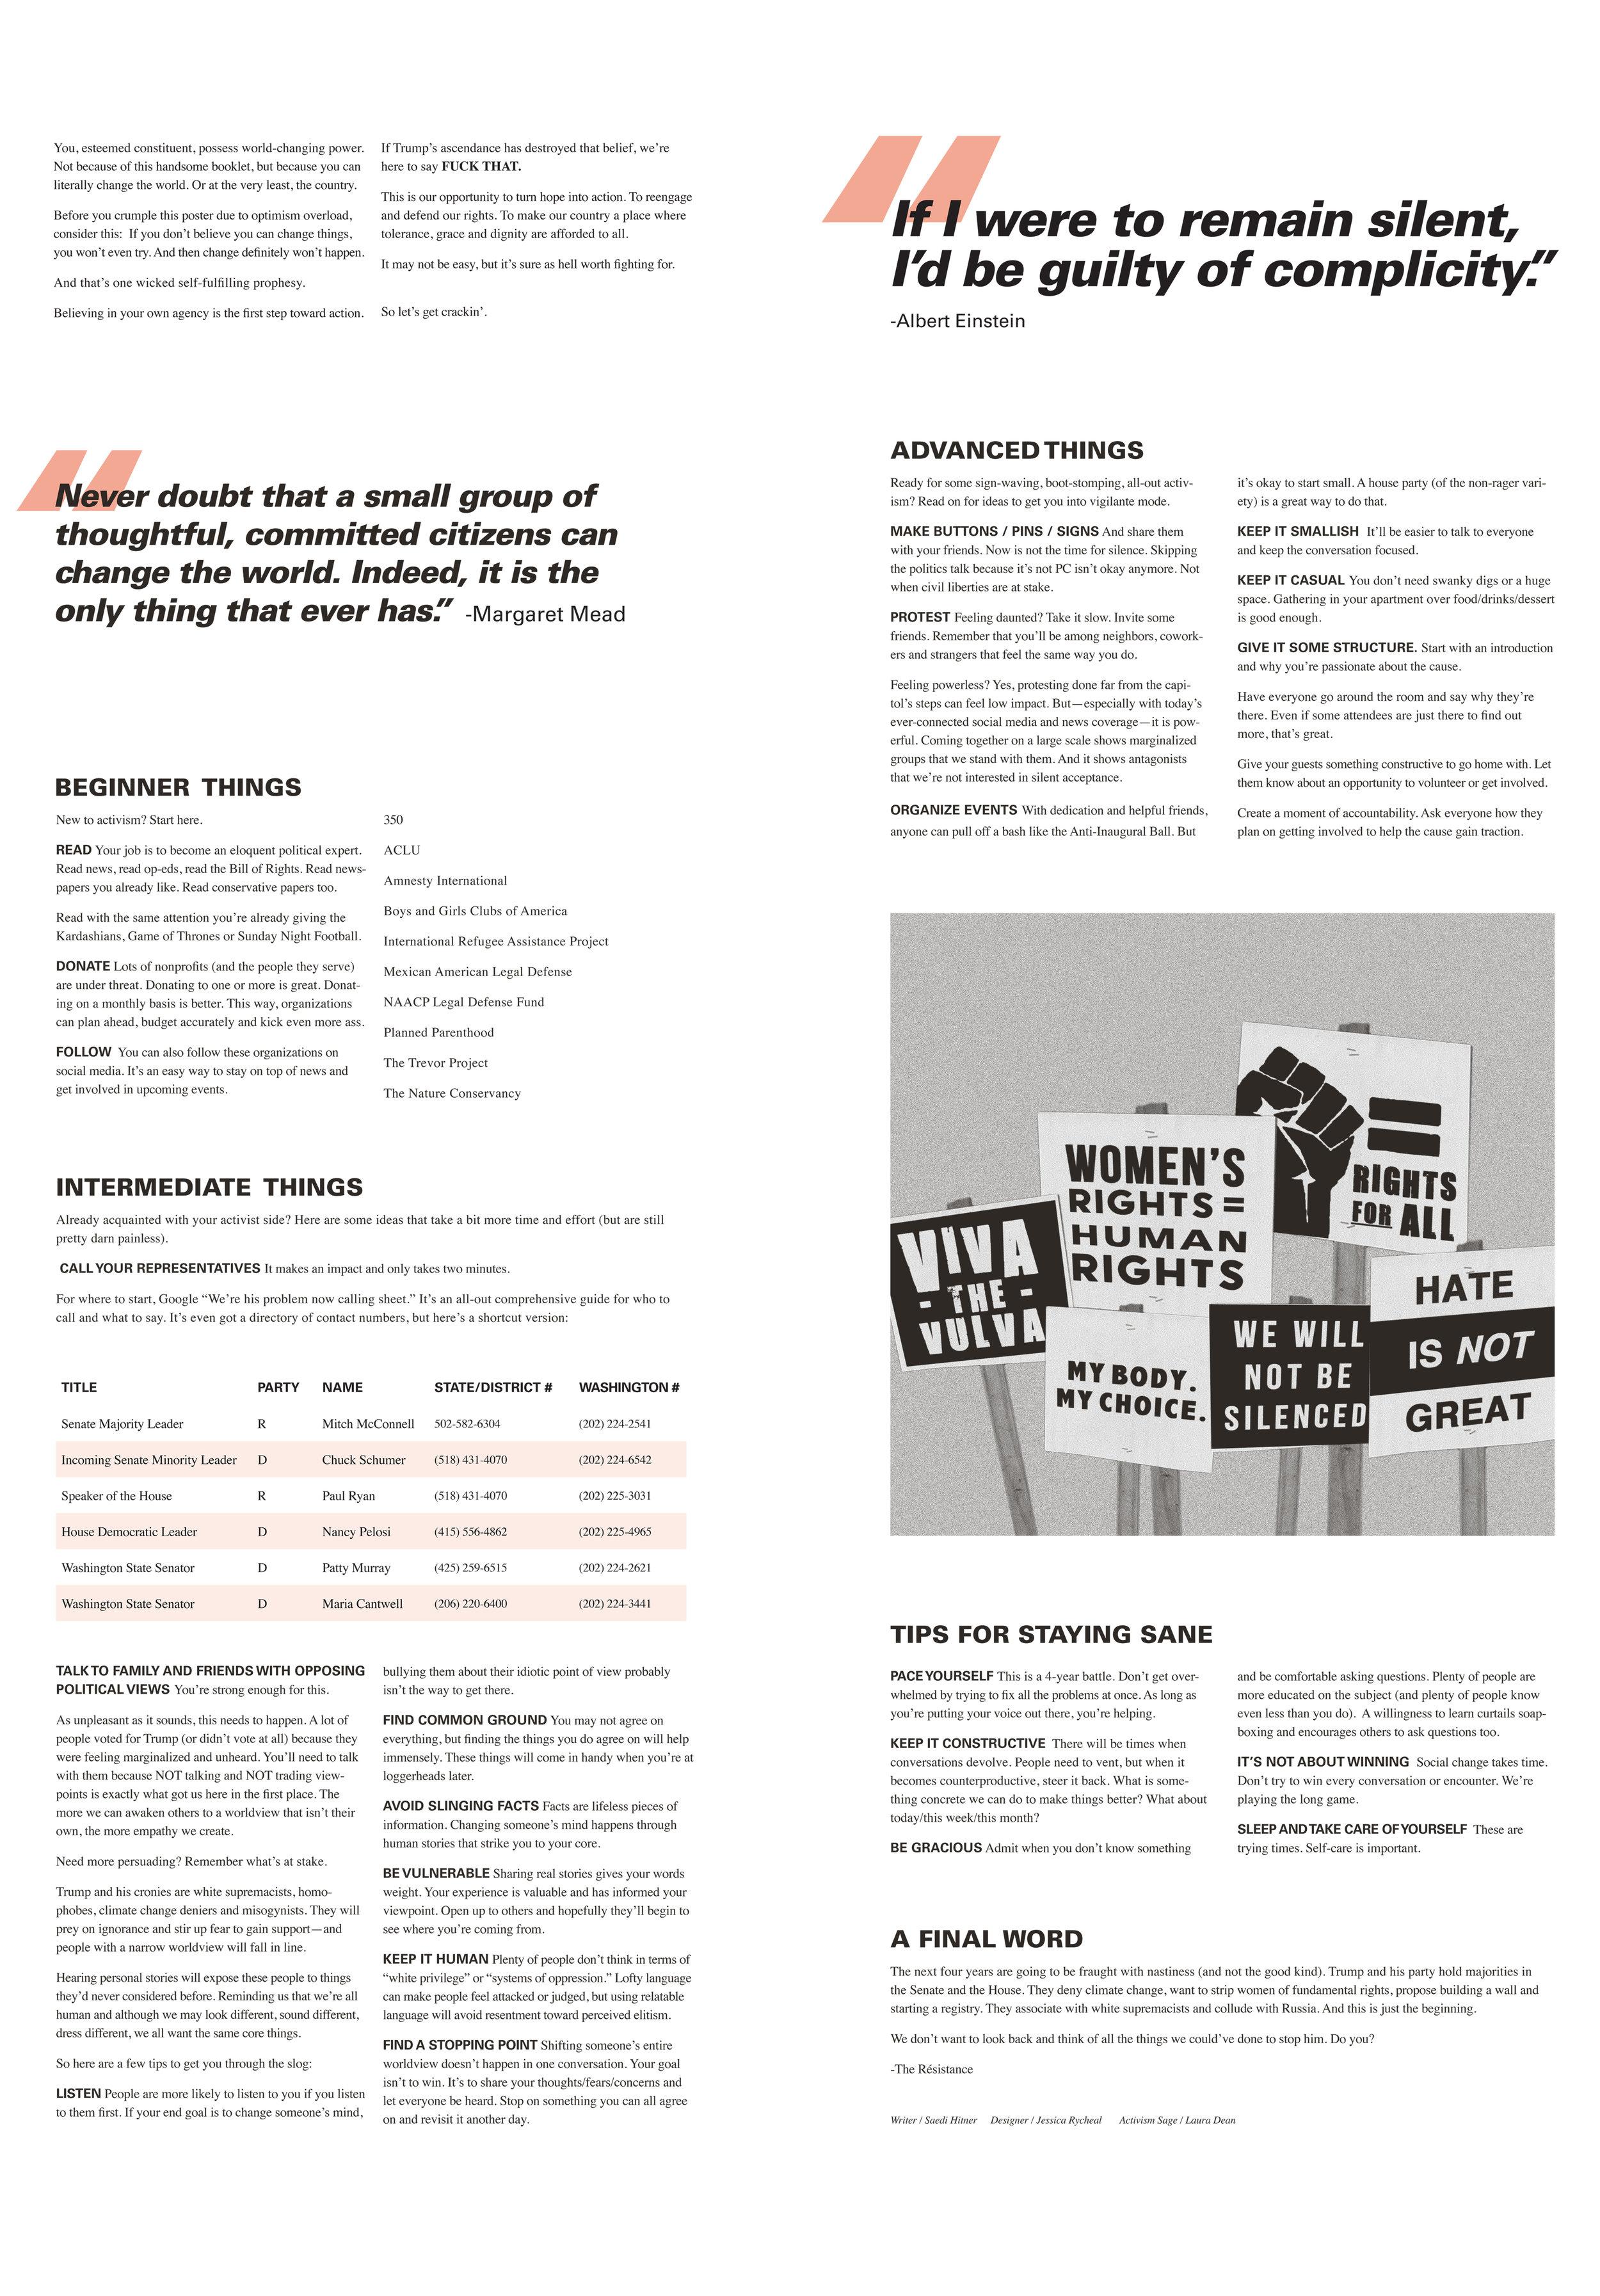 ACT16_Activism101_Poster_p2.jpg